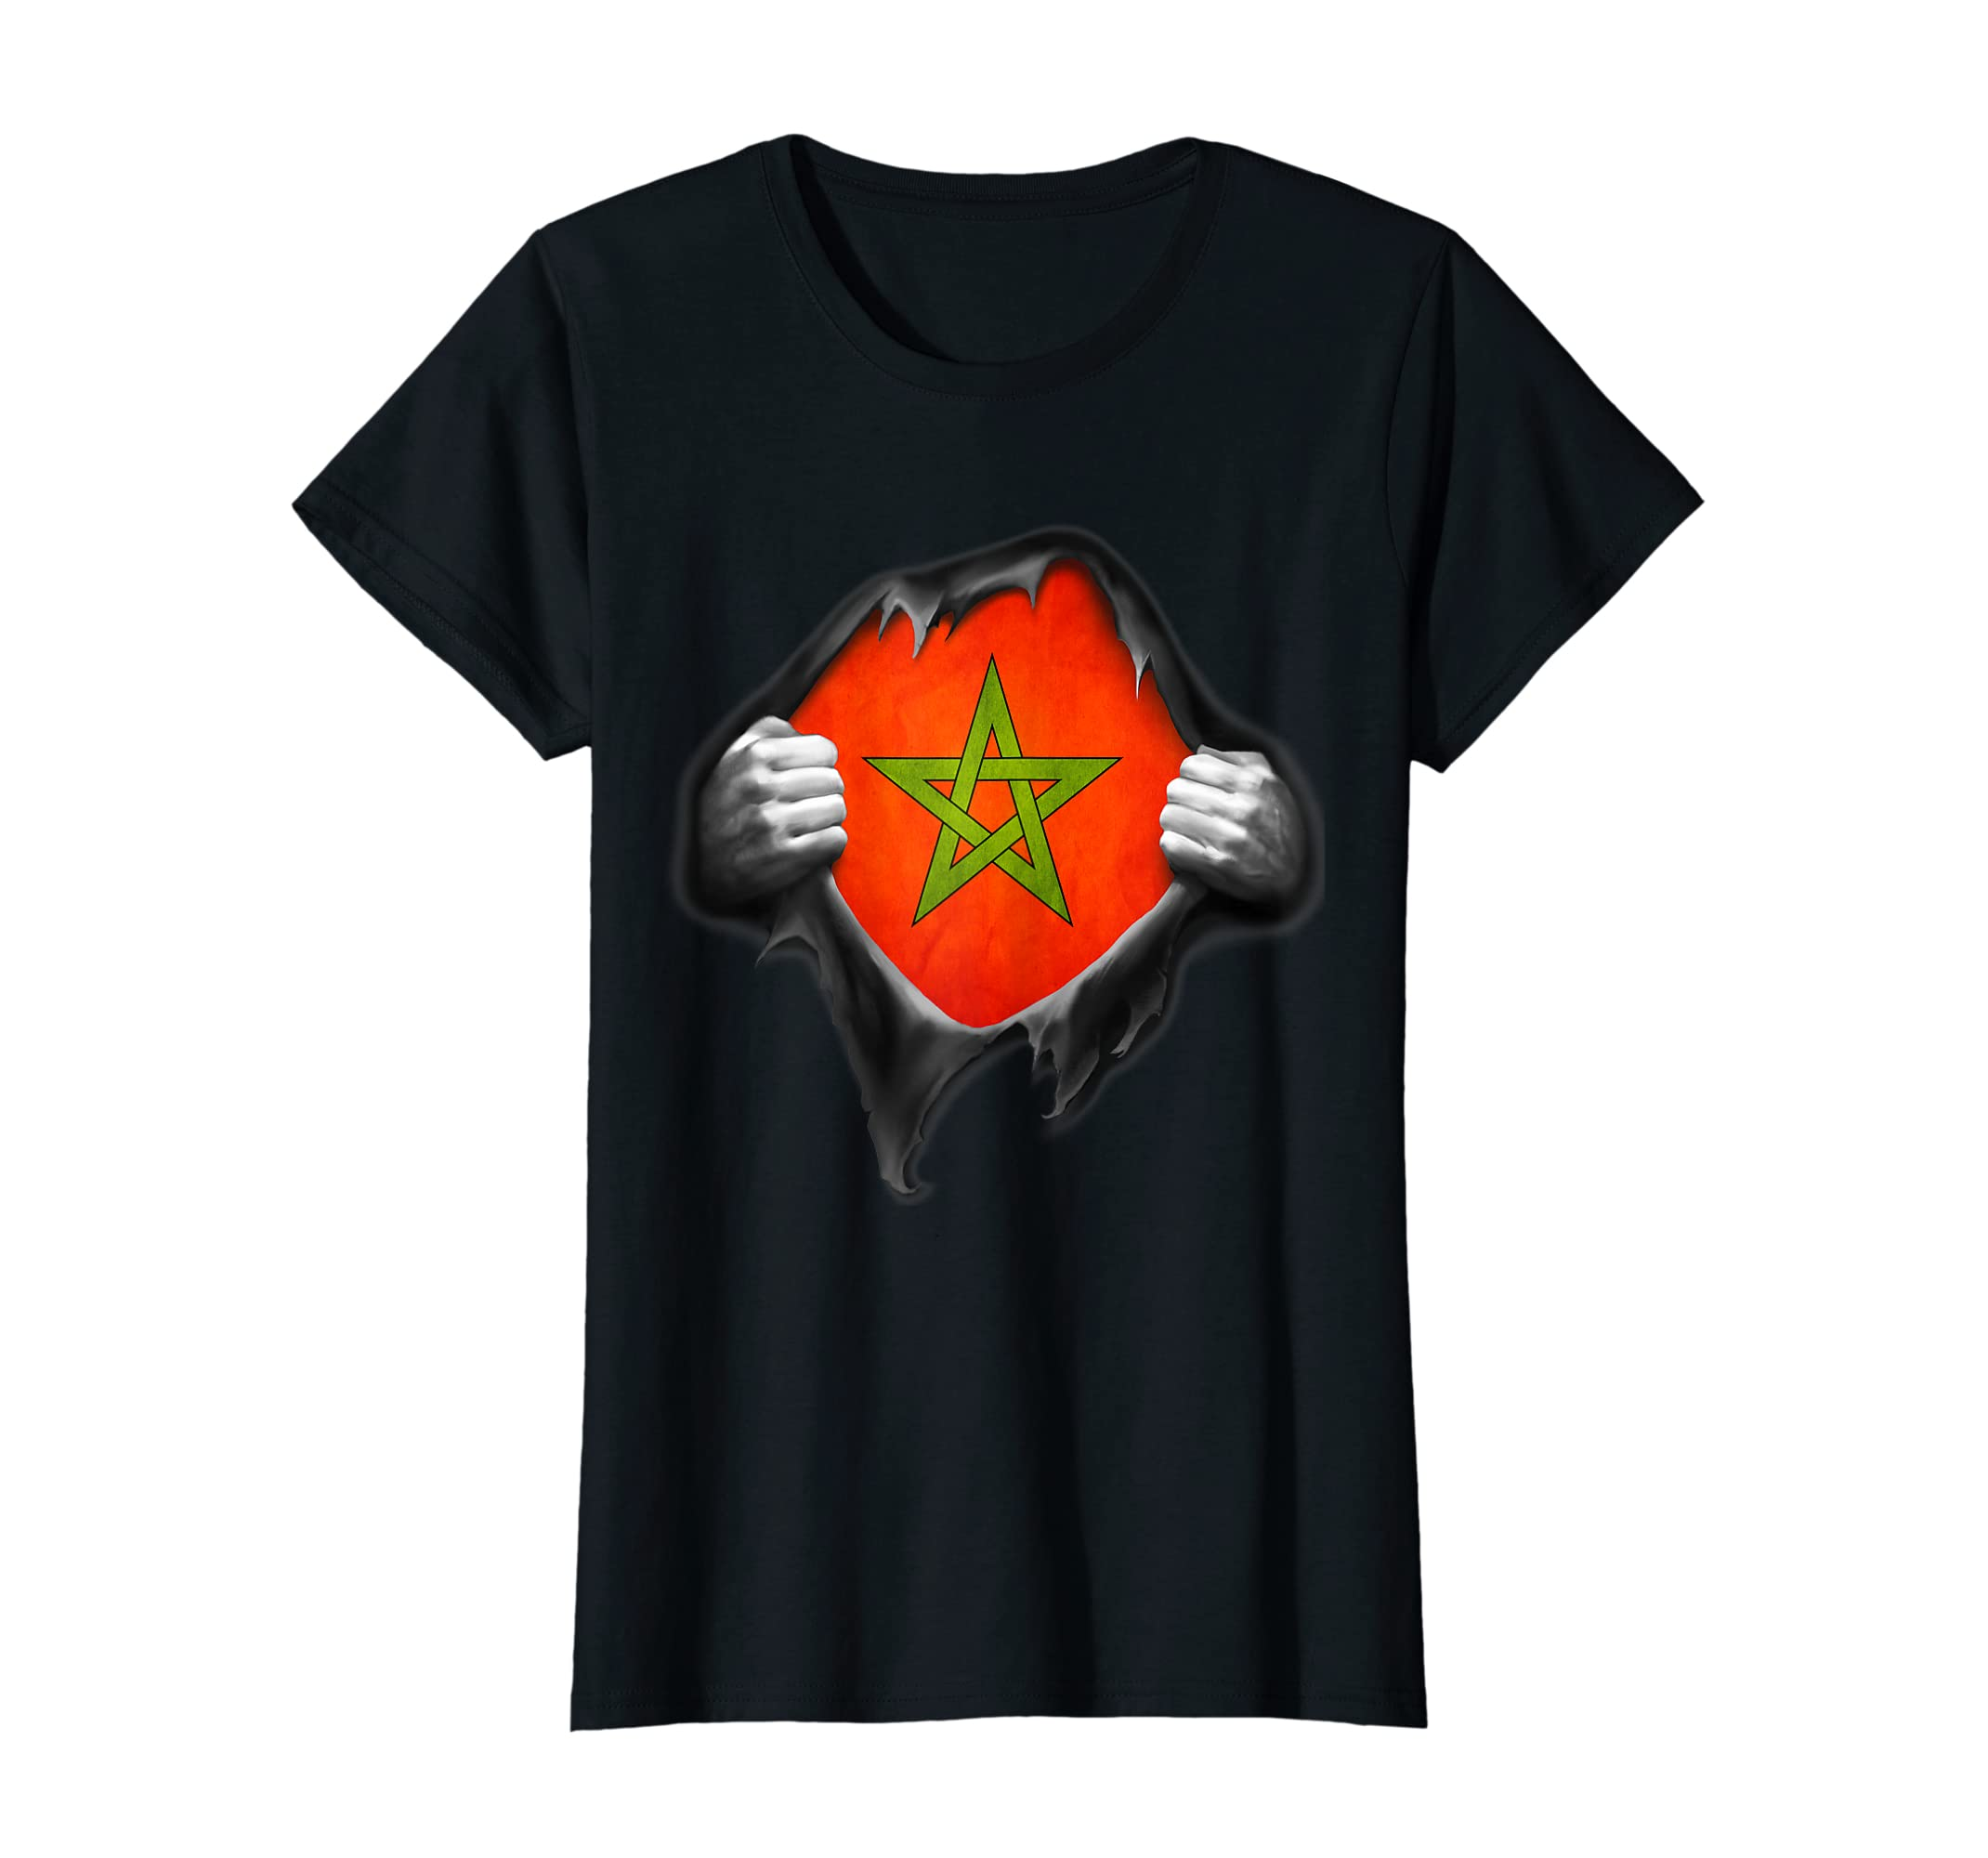 5384f68195d Amazon.com: Morocco National Flag T Shirt. Proud Moroccan Soccer Fan:  Clothing